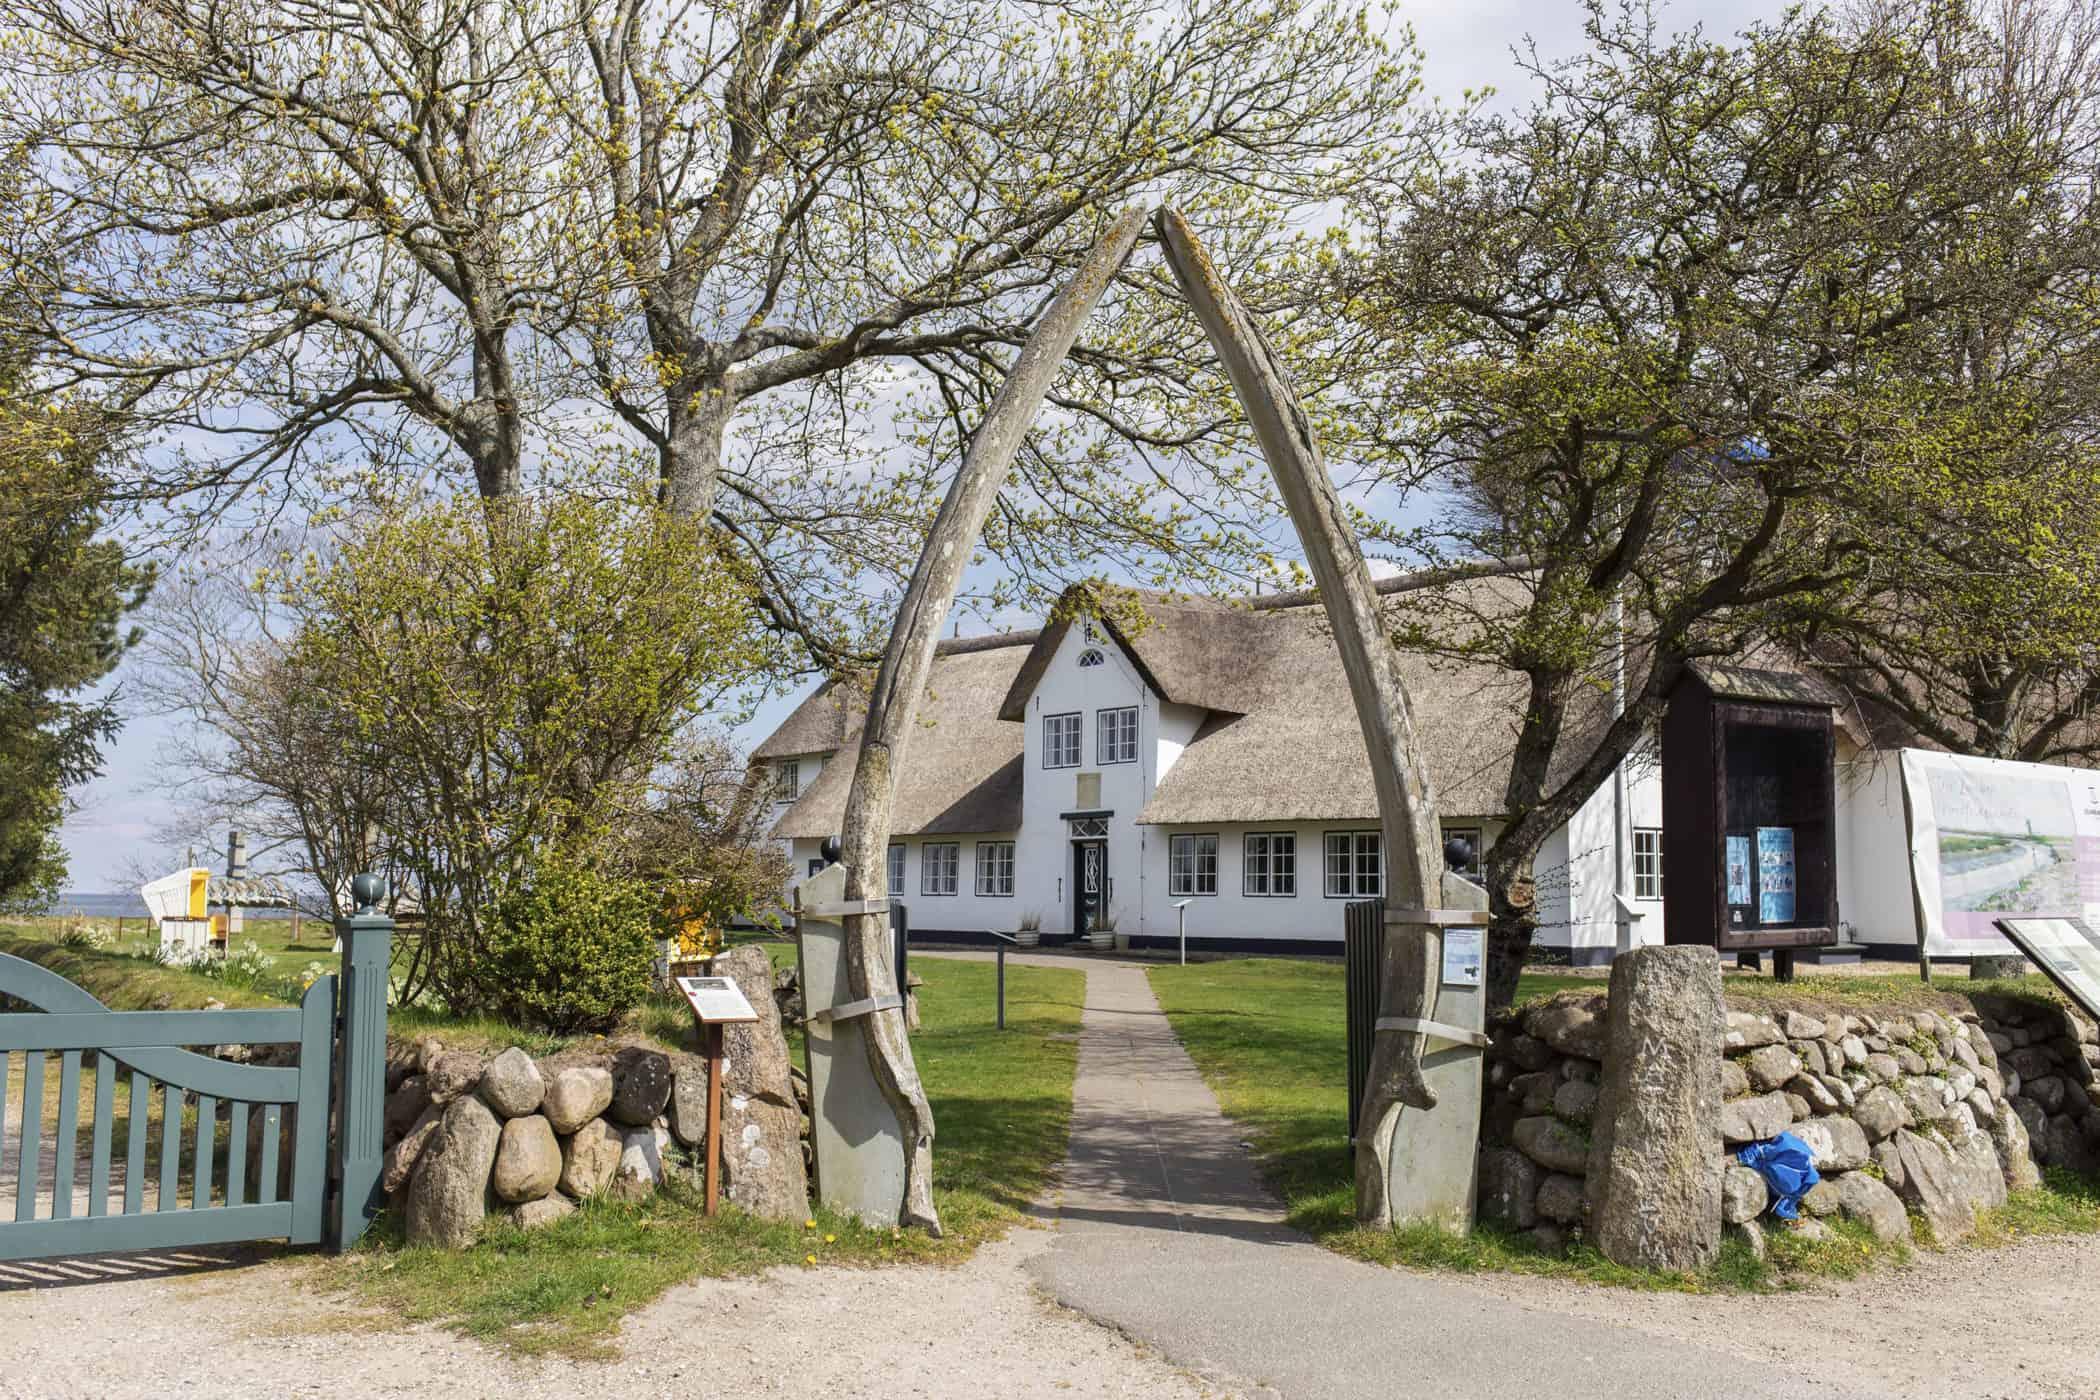 Sylt Museum Keitum Aussenansicht